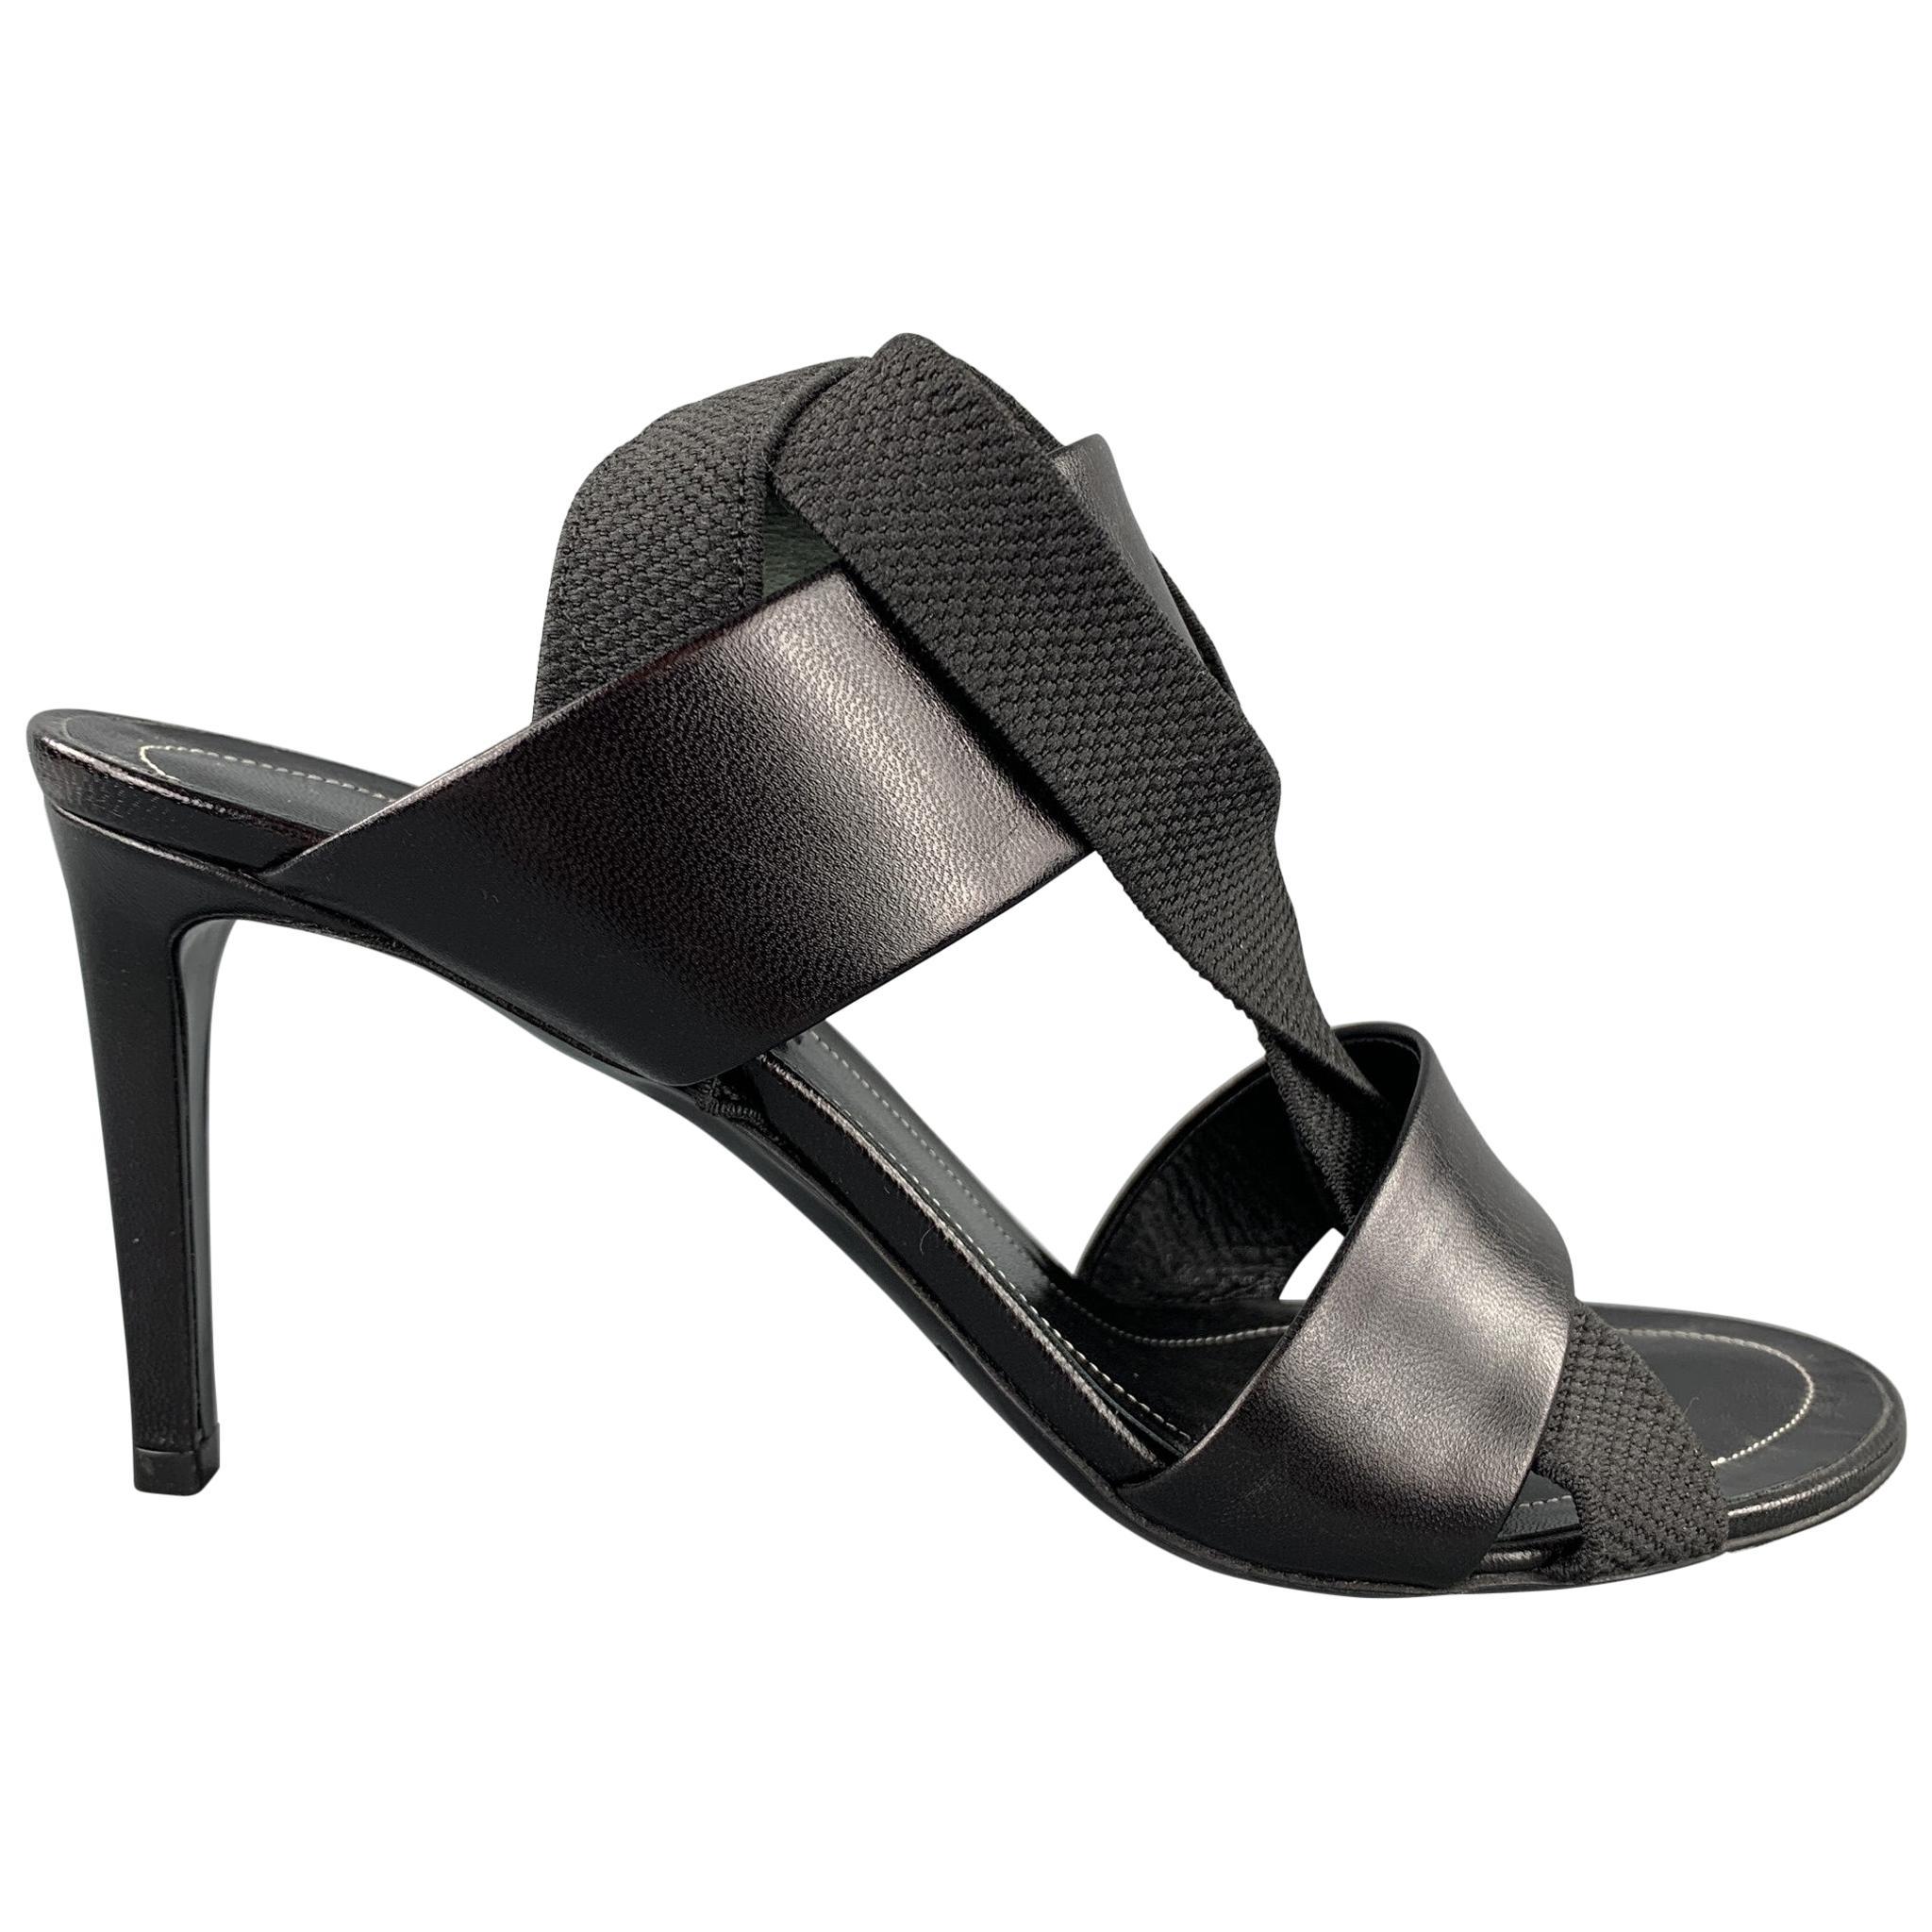 BALENCIAGA Size 8 Black Leather Ribbon Strappy Heel Sandals